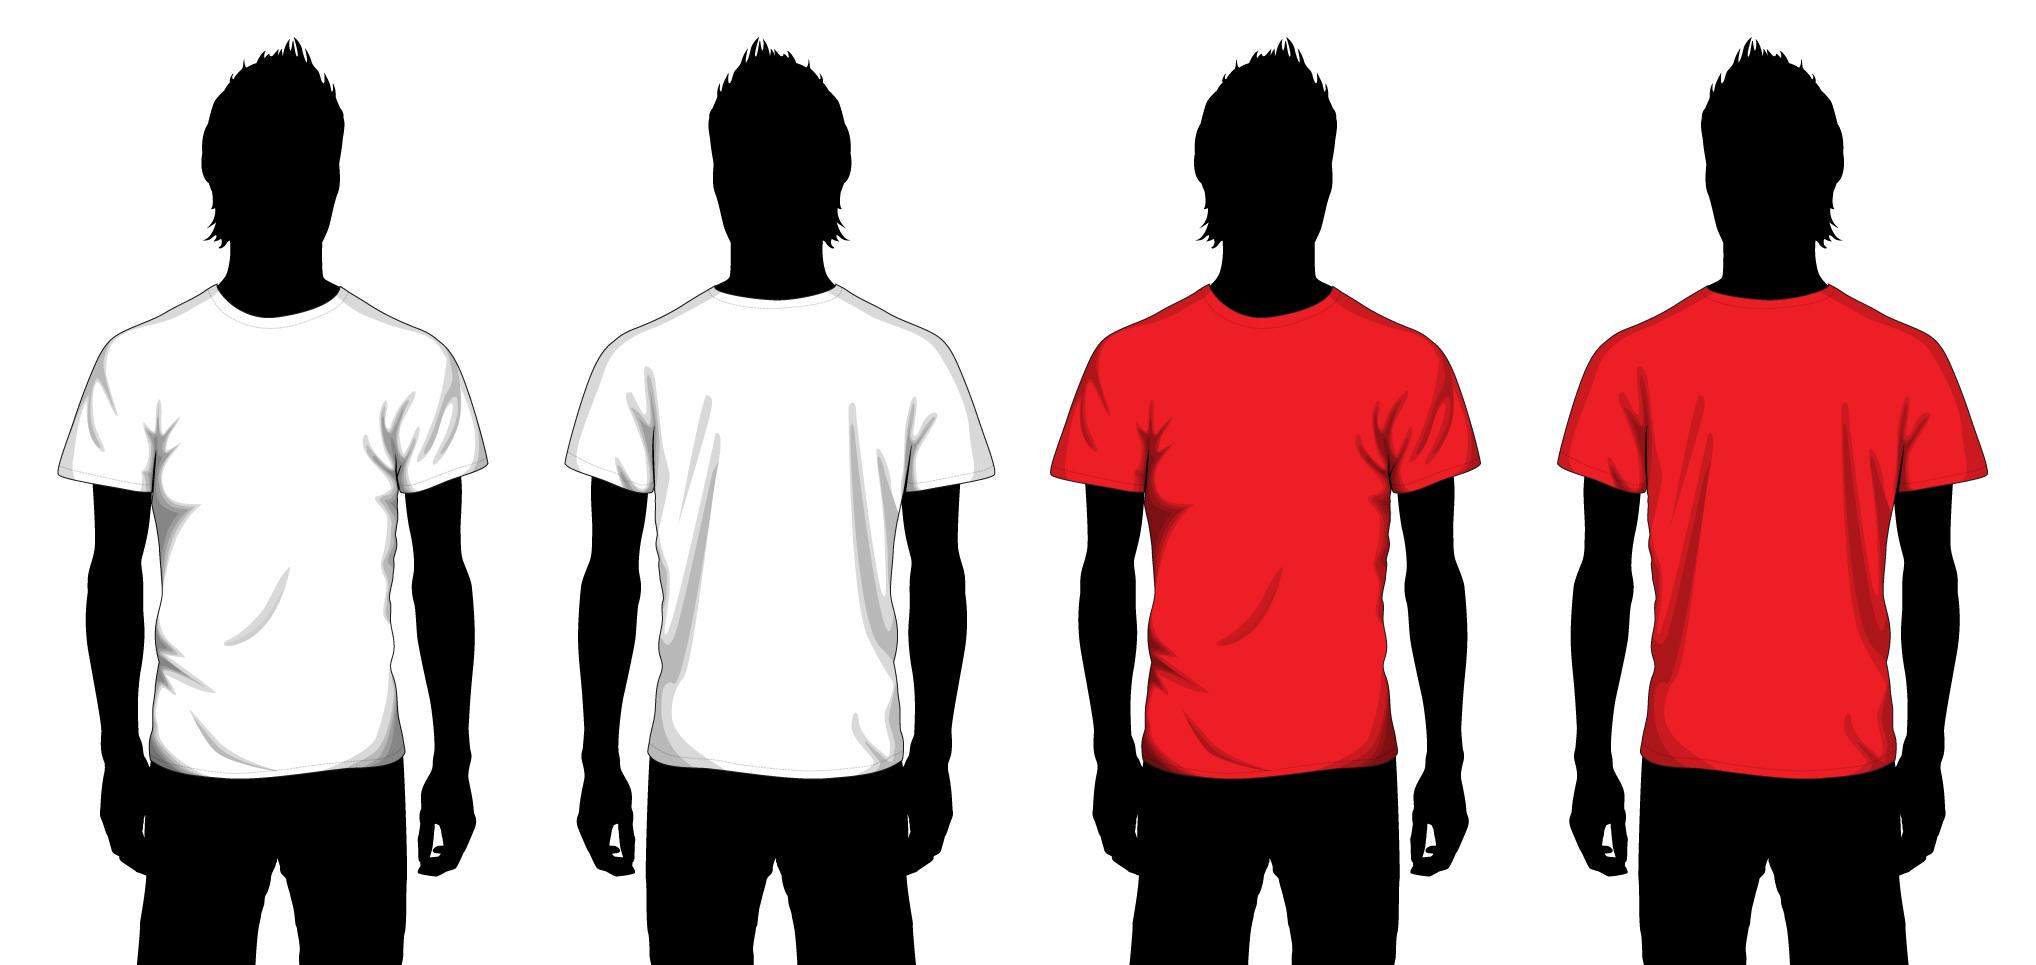 Shirts clipart man shirt, Shirts man shirt Transparent FREE.